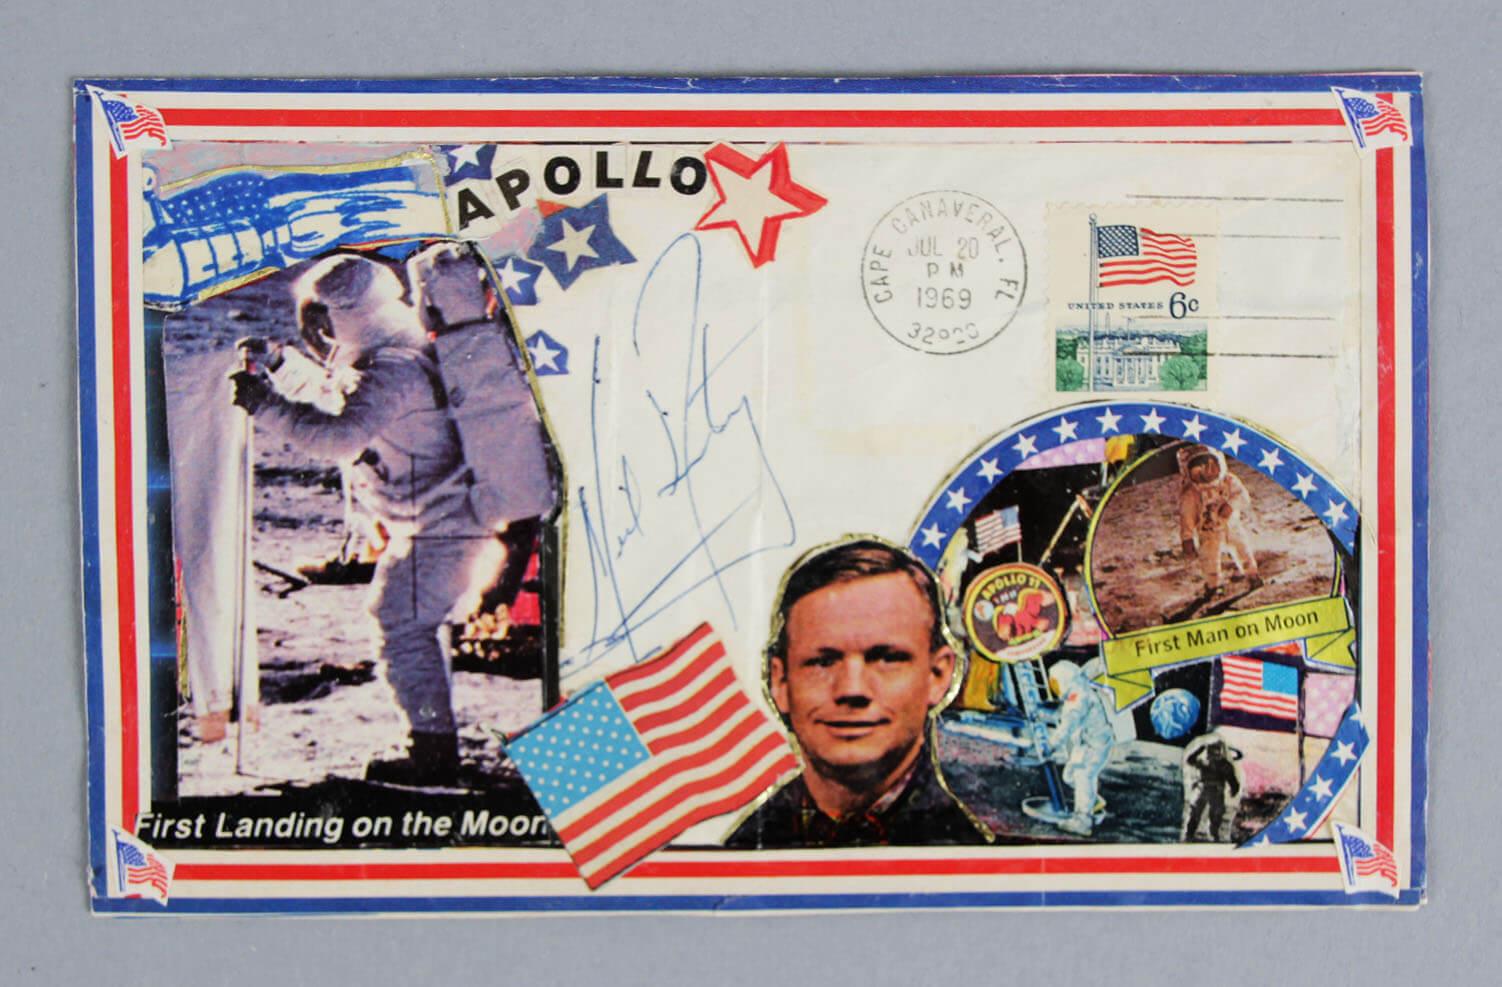 Astronaut Neil Armstrong Signed FDC Cachet NASA - JSA Full LOA